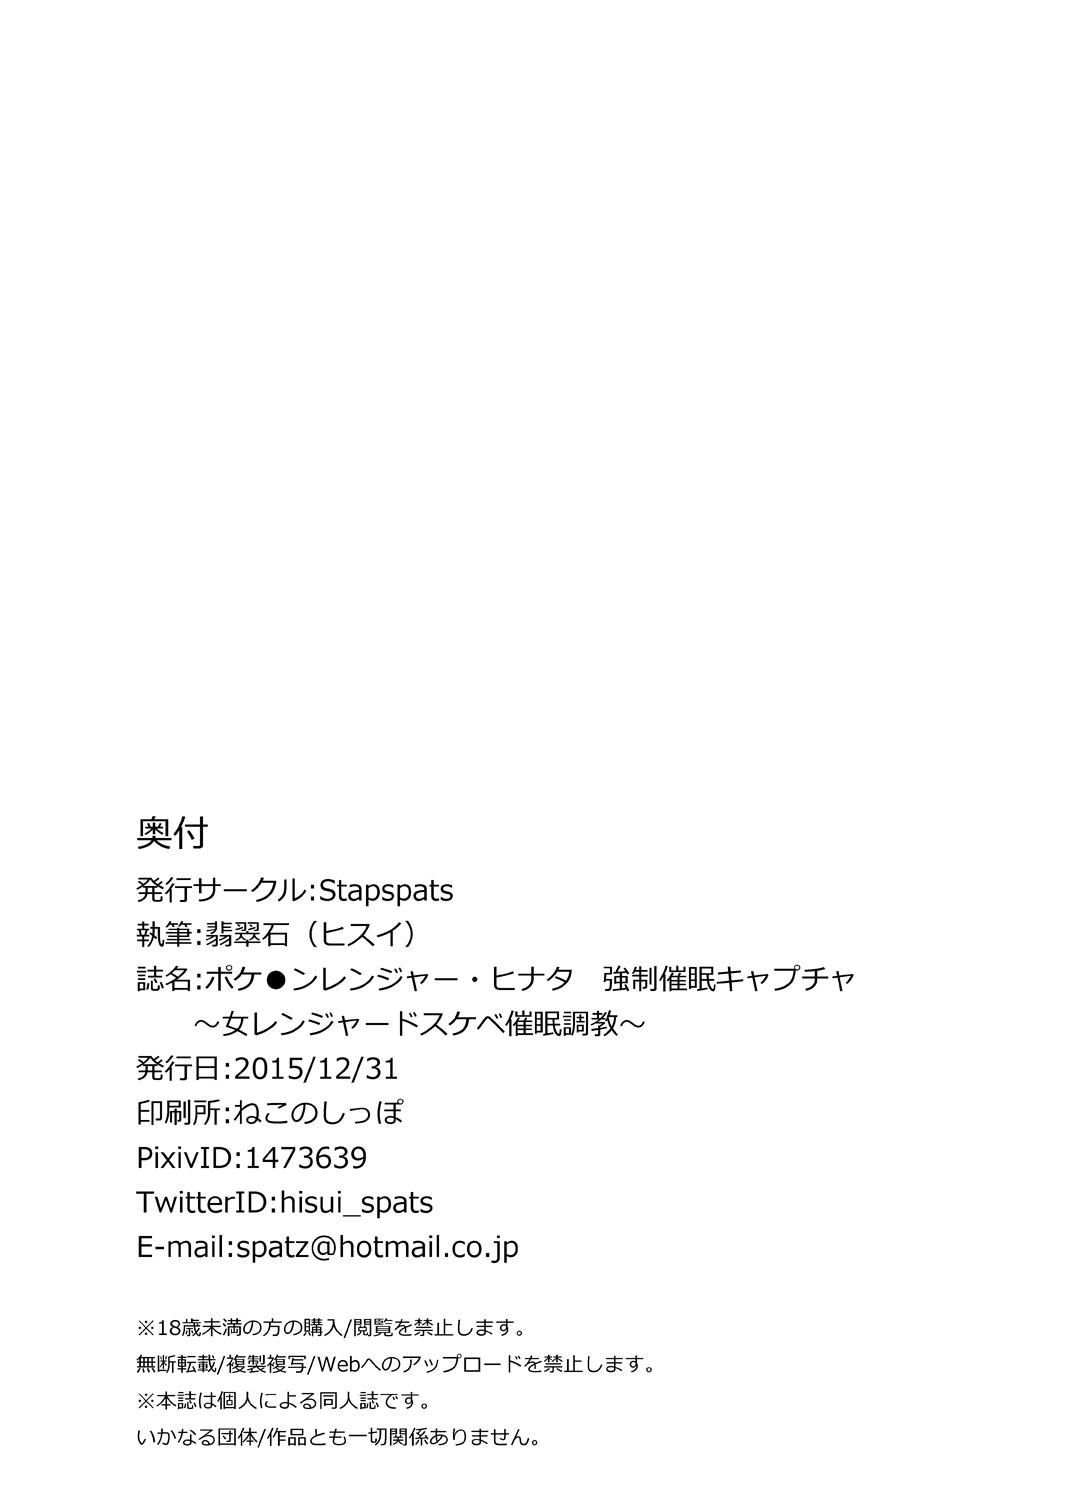 [Stapspats (Hisui)] Pokémon Ranger Hinata Kyousei Saimin Capture ~Onna Ranger Dosukebe Saimin Choukyou~ | Pokémon Ranger Solana's Forced Hypnosis Capture ~Female Ranger's Sexual Hypnosis Training~ (Pokémon) [Digital] [English] 21